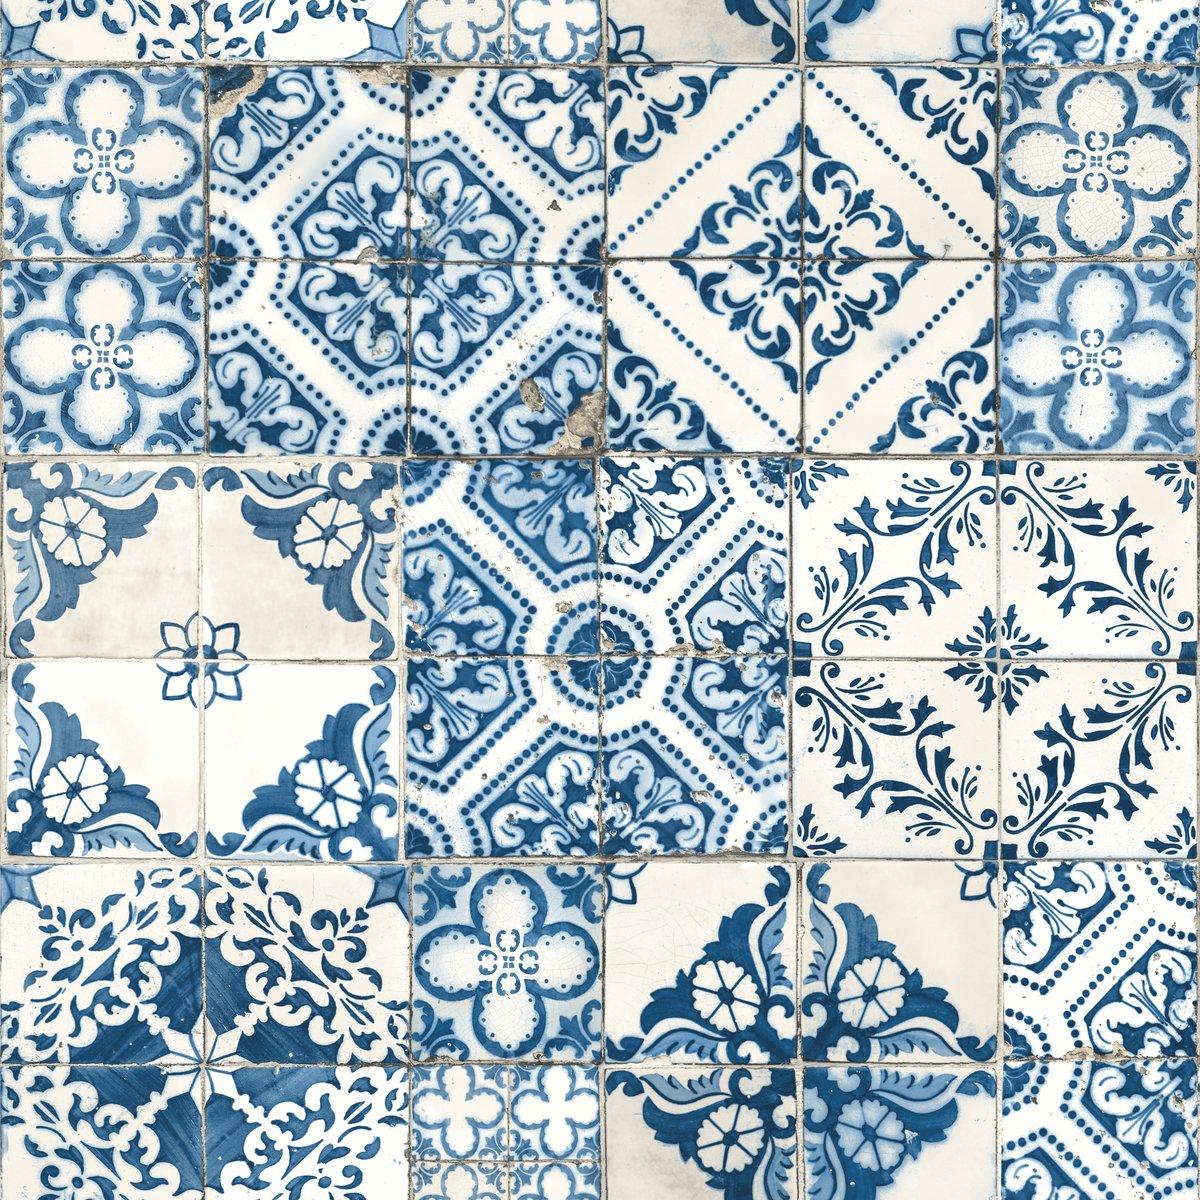 RoomMates RMK11083WP Peel and Stick Wallpaper, 20.5'' x 16.5 Feet, Blue